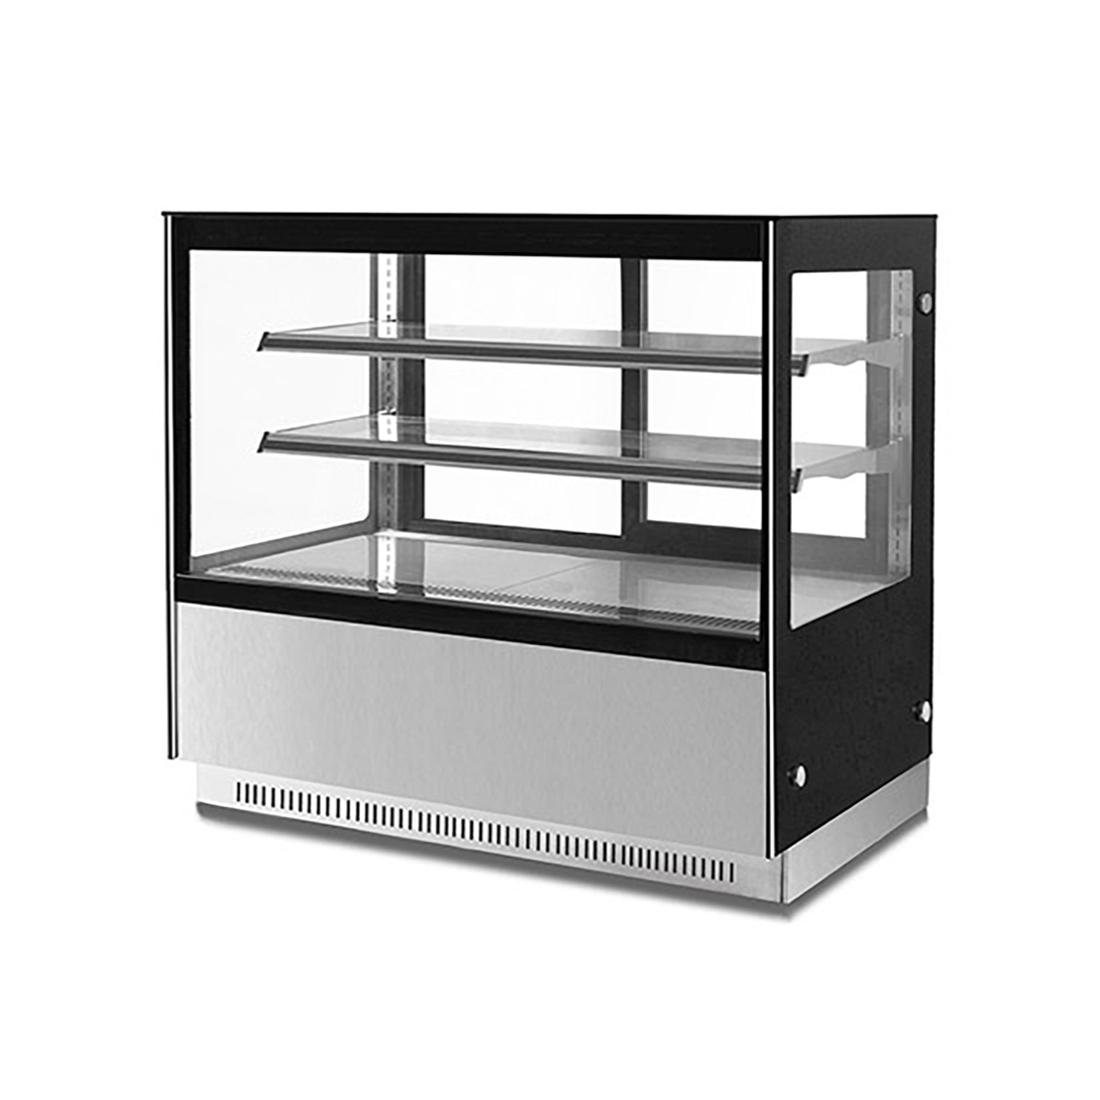 Modern 2 Shelves Cake or Food Display - GN-1500RF2